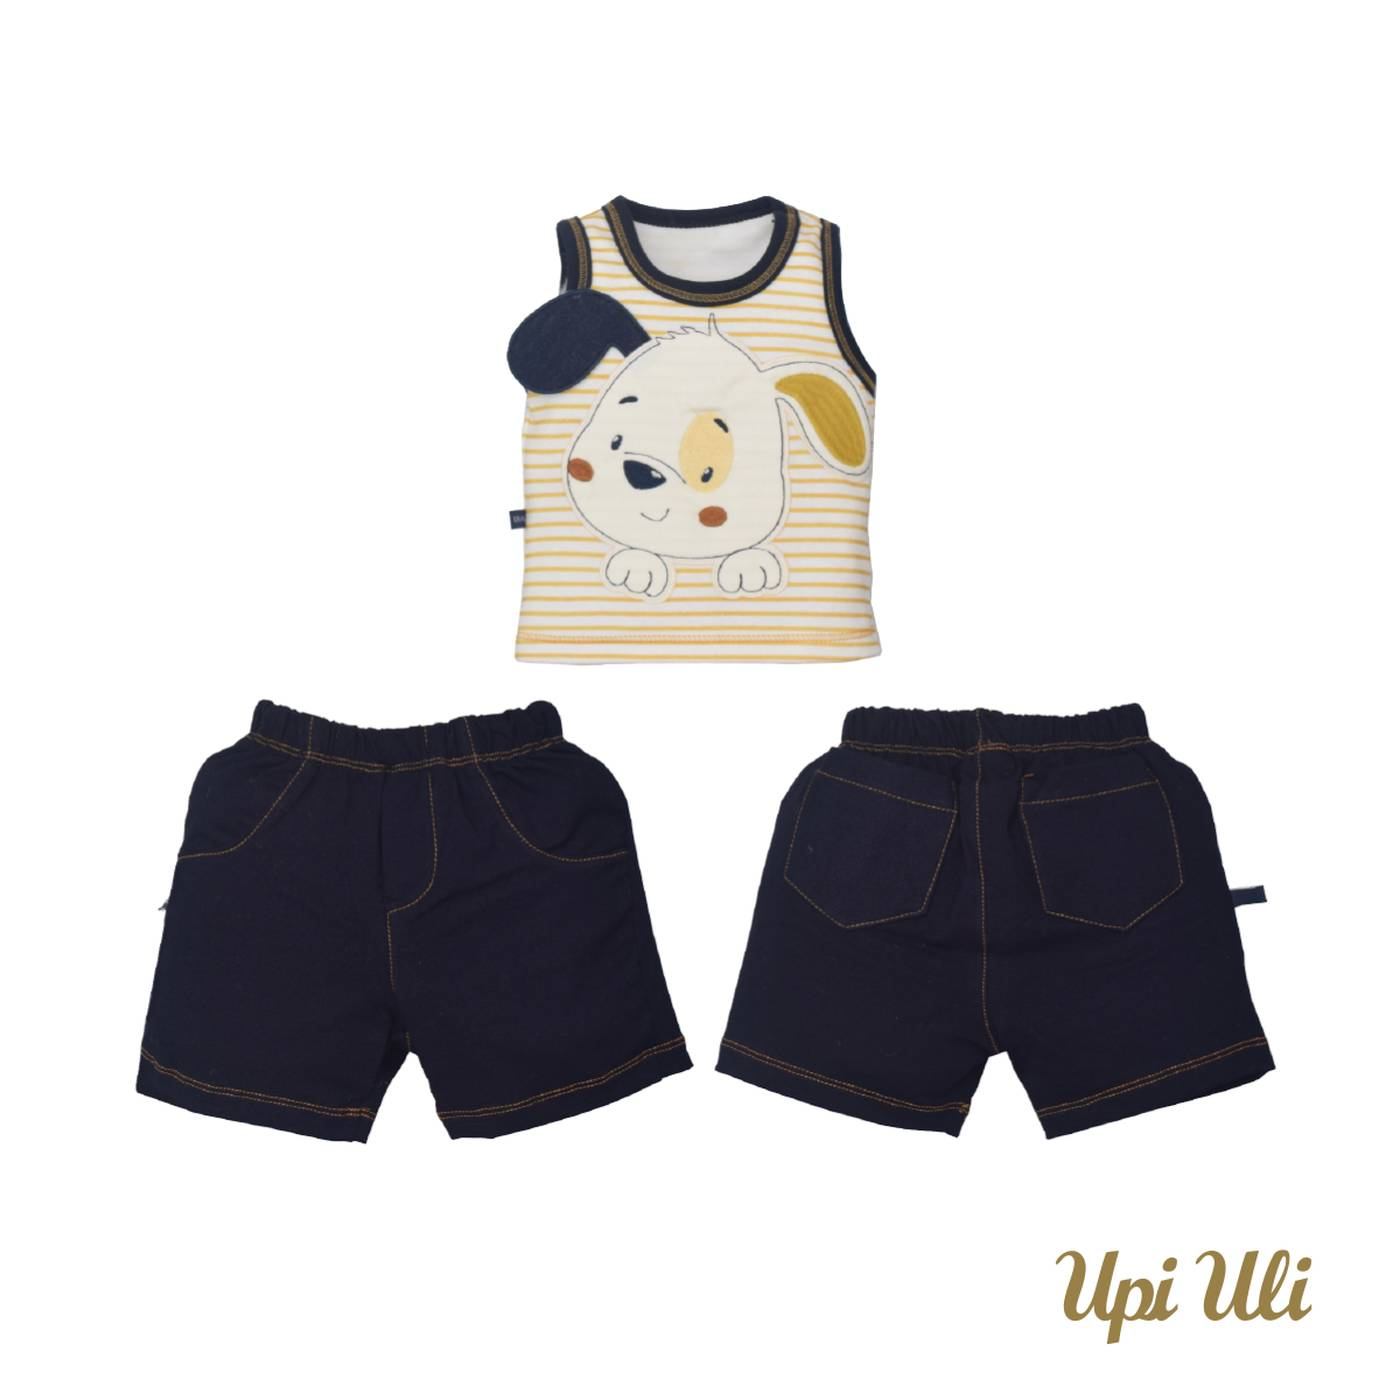 Conj. De Bebê Regata C/ Shorts Suedine/New Vanize Andre